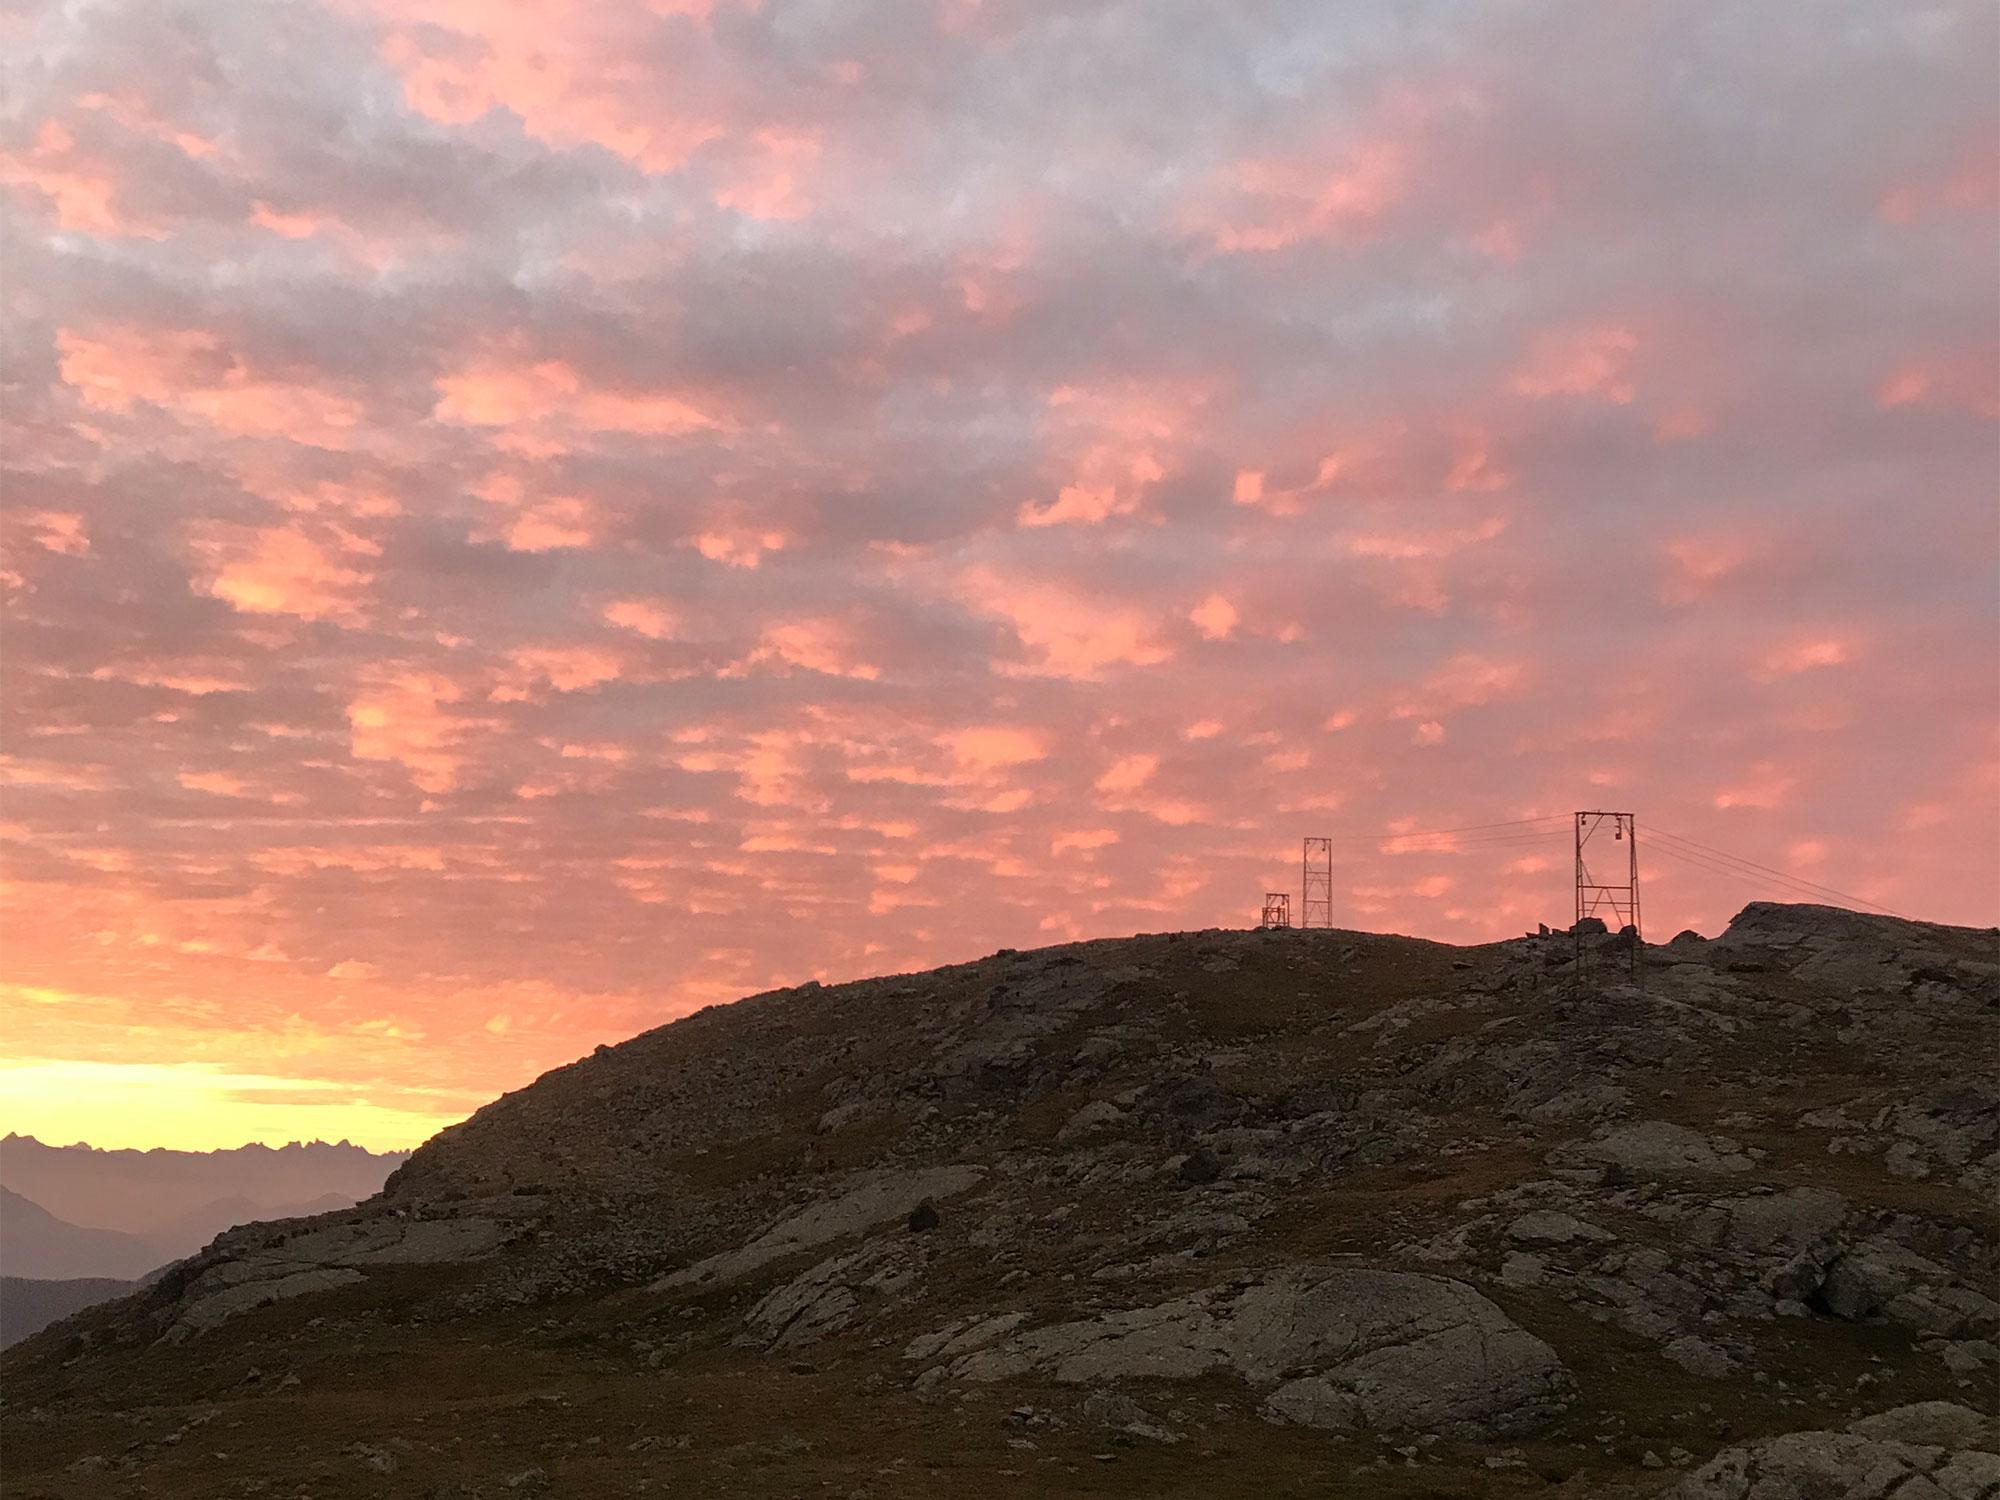 mmg-huettenwandern-tipps-morgenhimmel